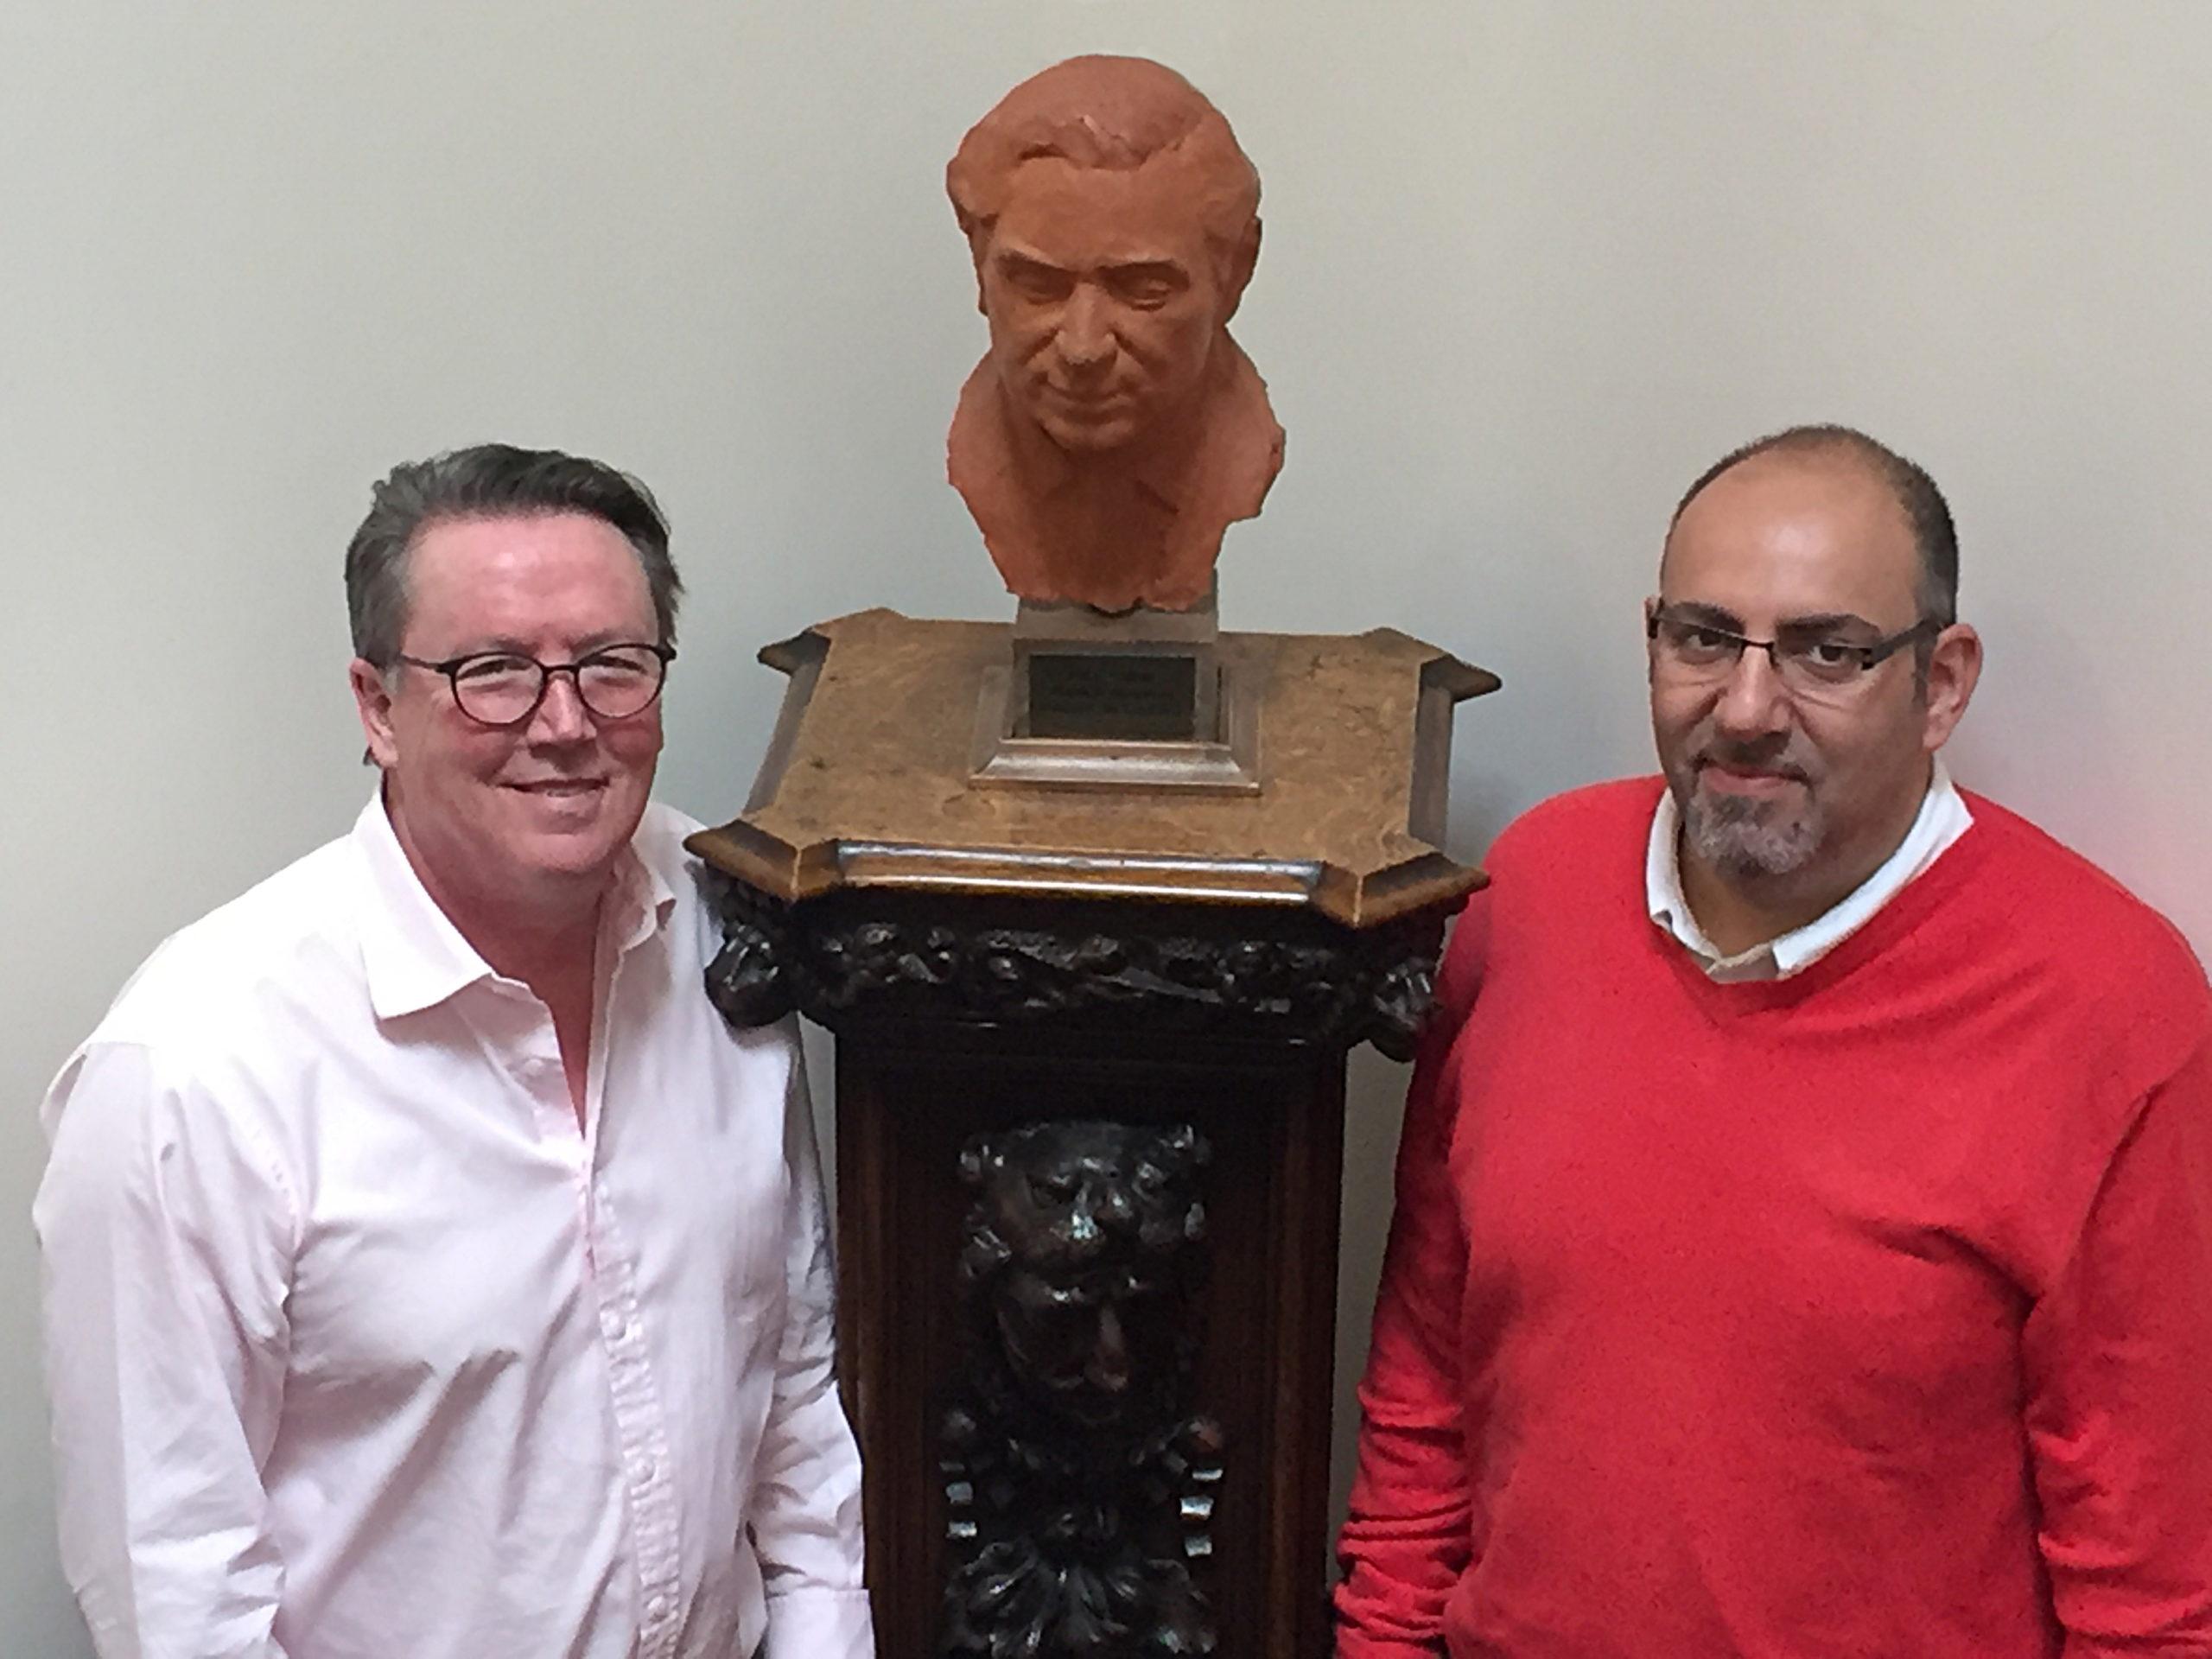 Bust of Patrick Steptoe at Bourn Hall Cambridge